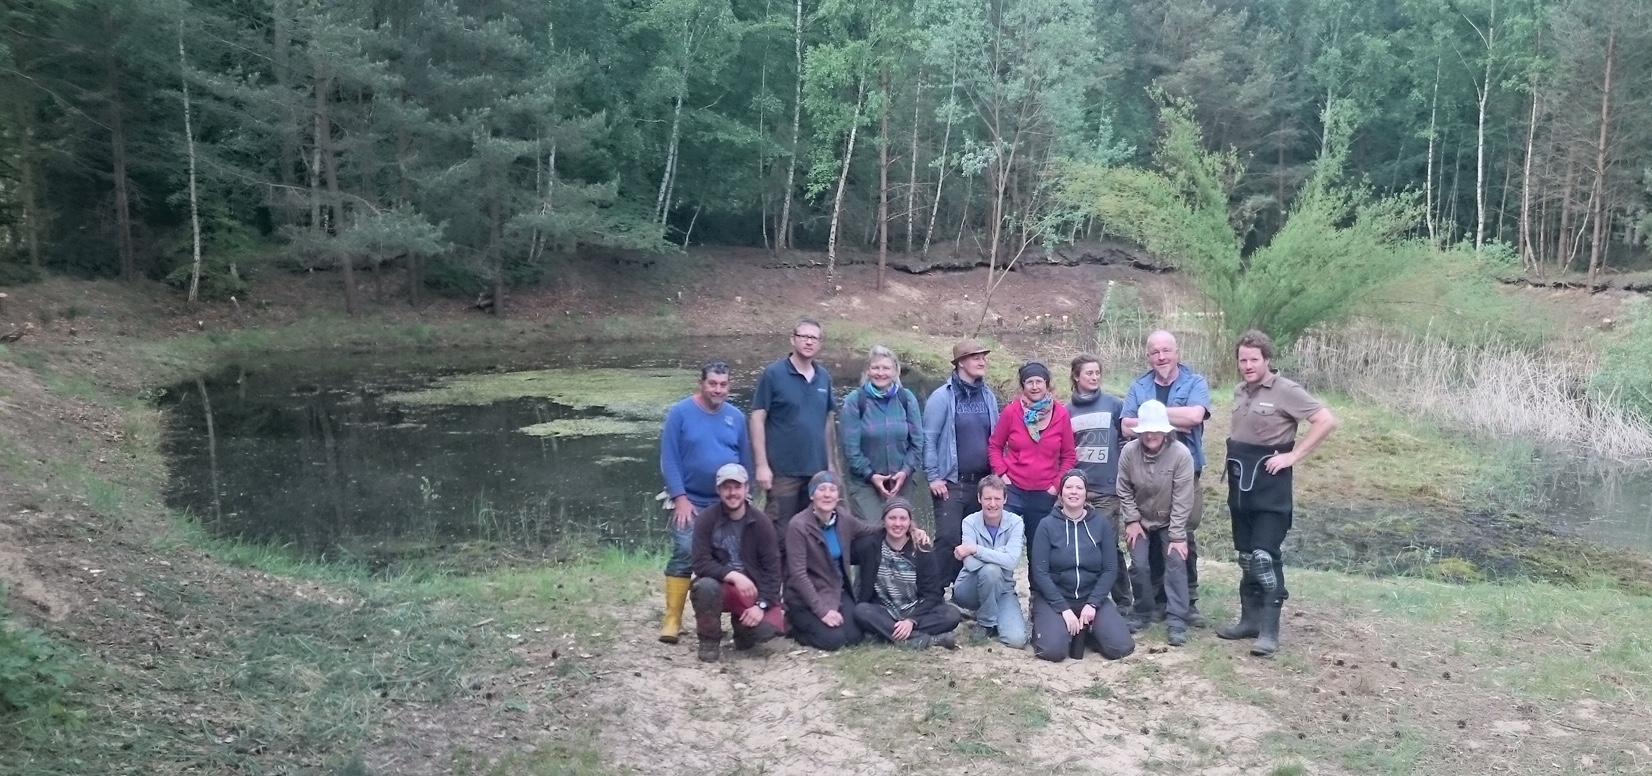 Gruppe vor ausgeholztem Feuchtbiotop